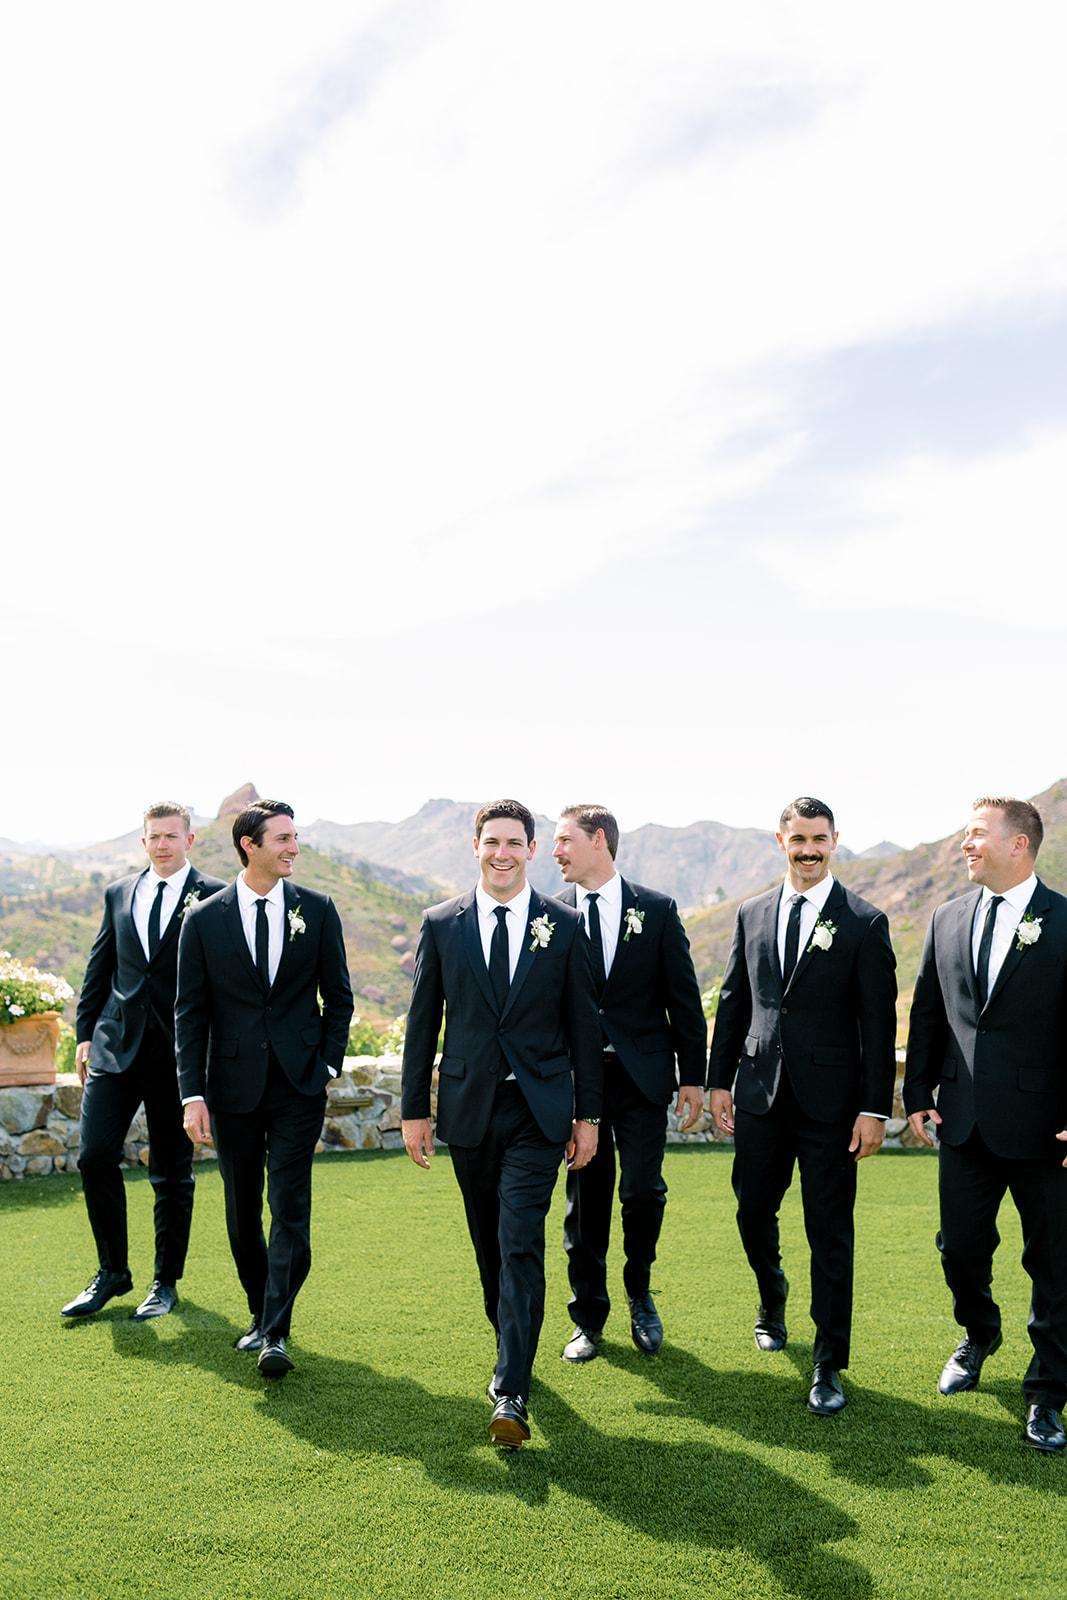 Ben & Emma's Wedding - Natalie Schutt Photography - Bridal Party-52.jpg